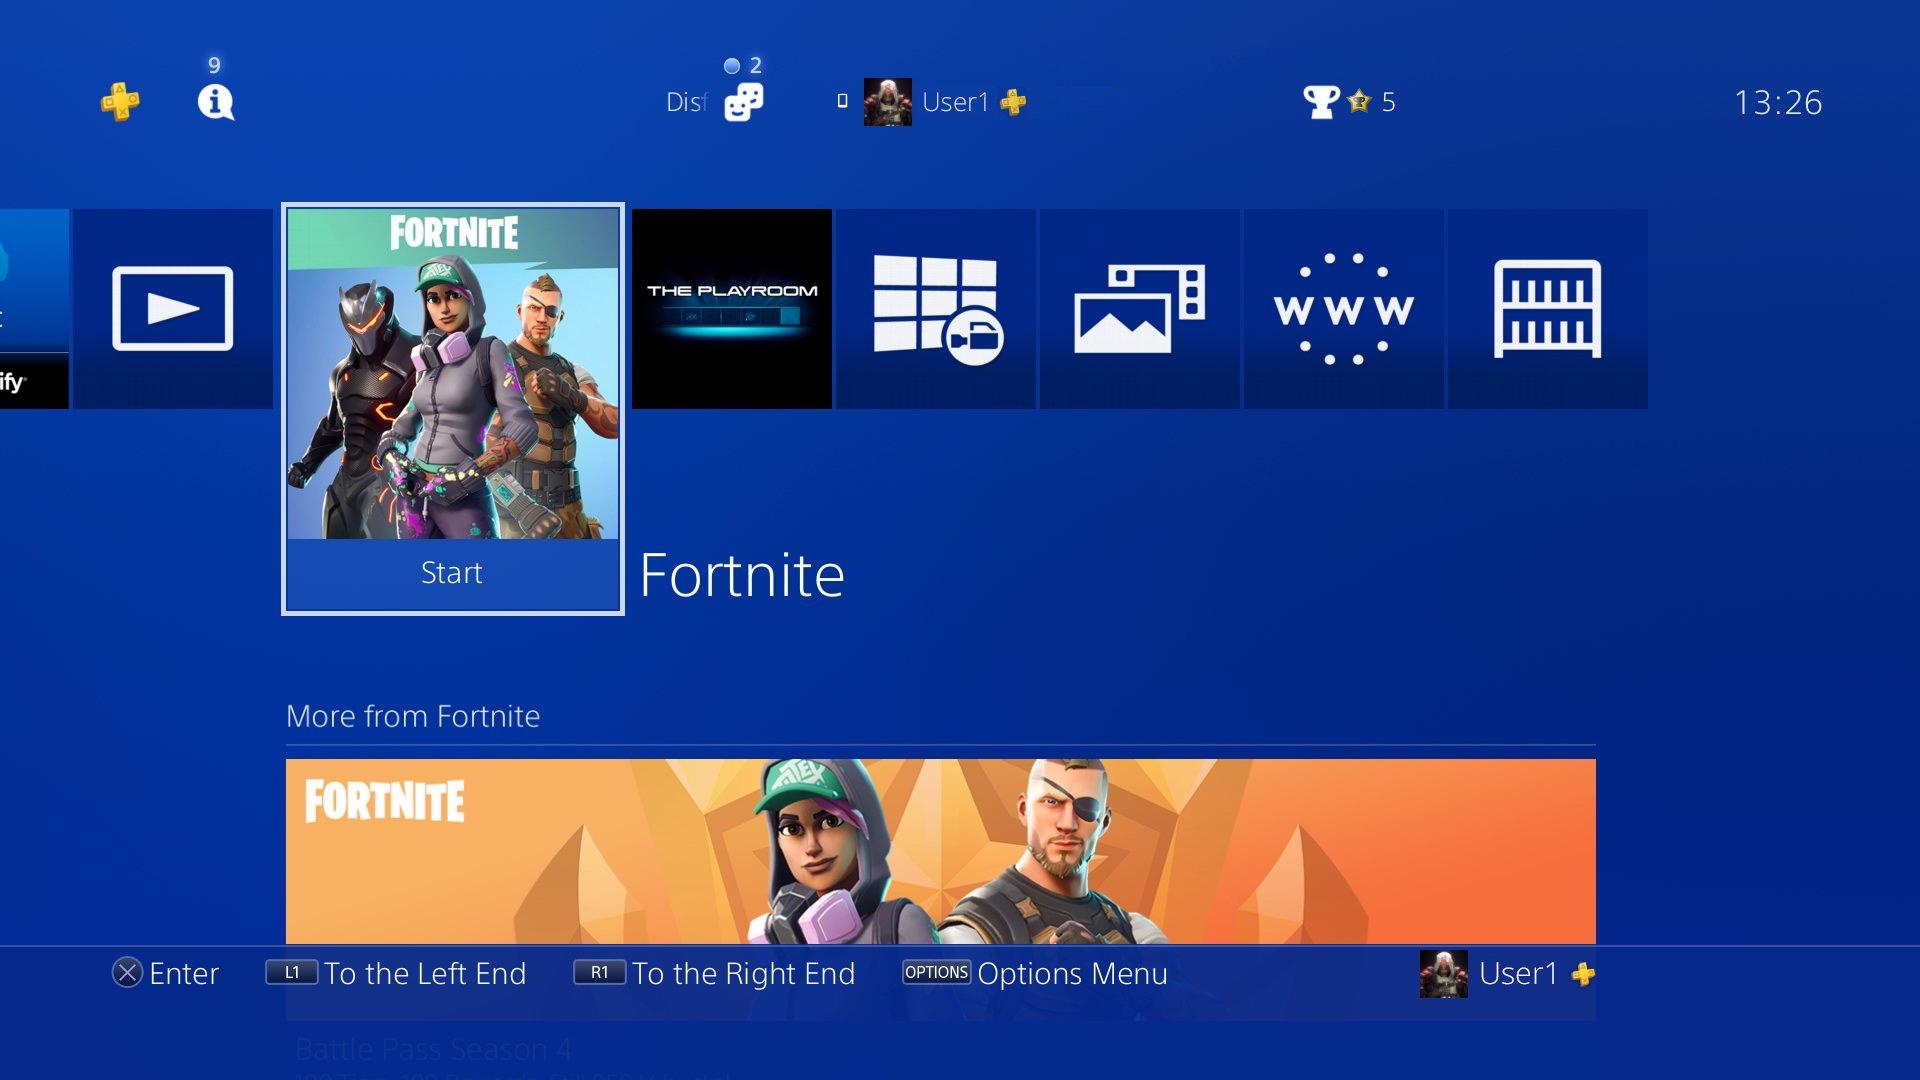 PS4 Slim 1Tb Negra Playstation 4 Consola Pack + Fortnite: Battle ...